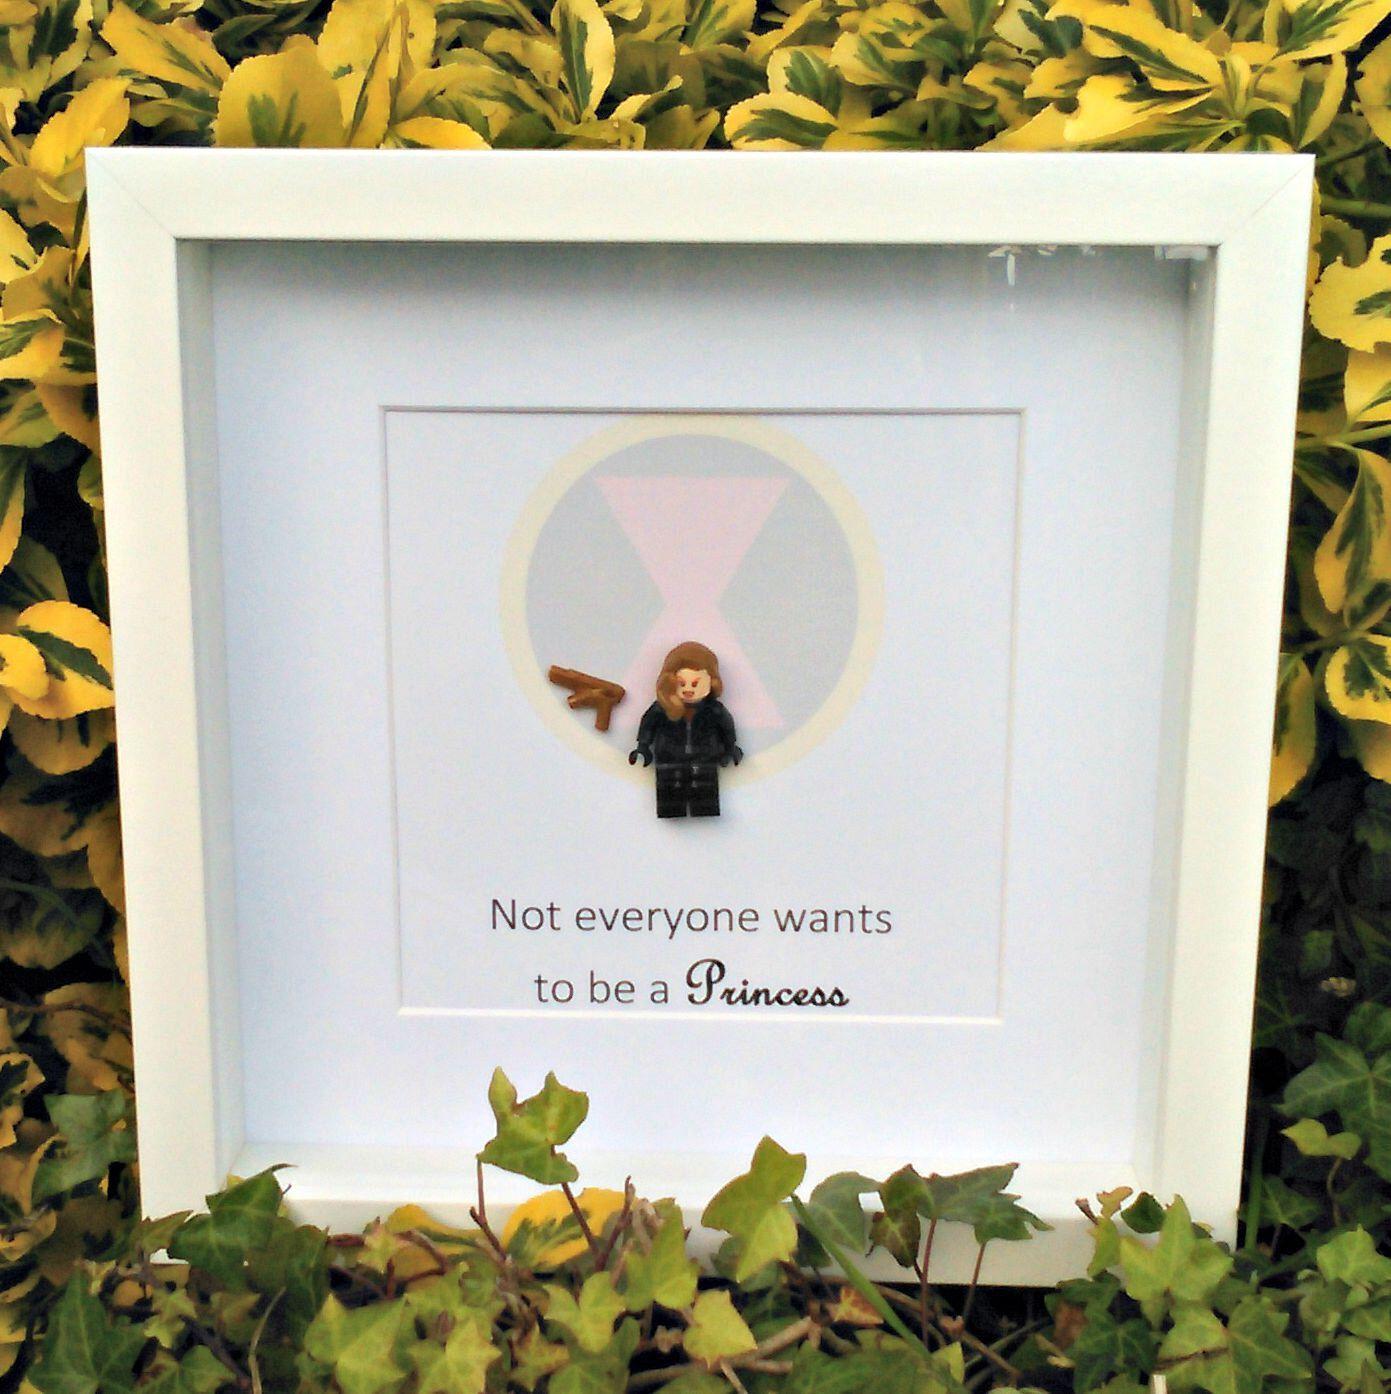 Princess Black Widow Brick Figure Art Not Everyone Wants To Be A